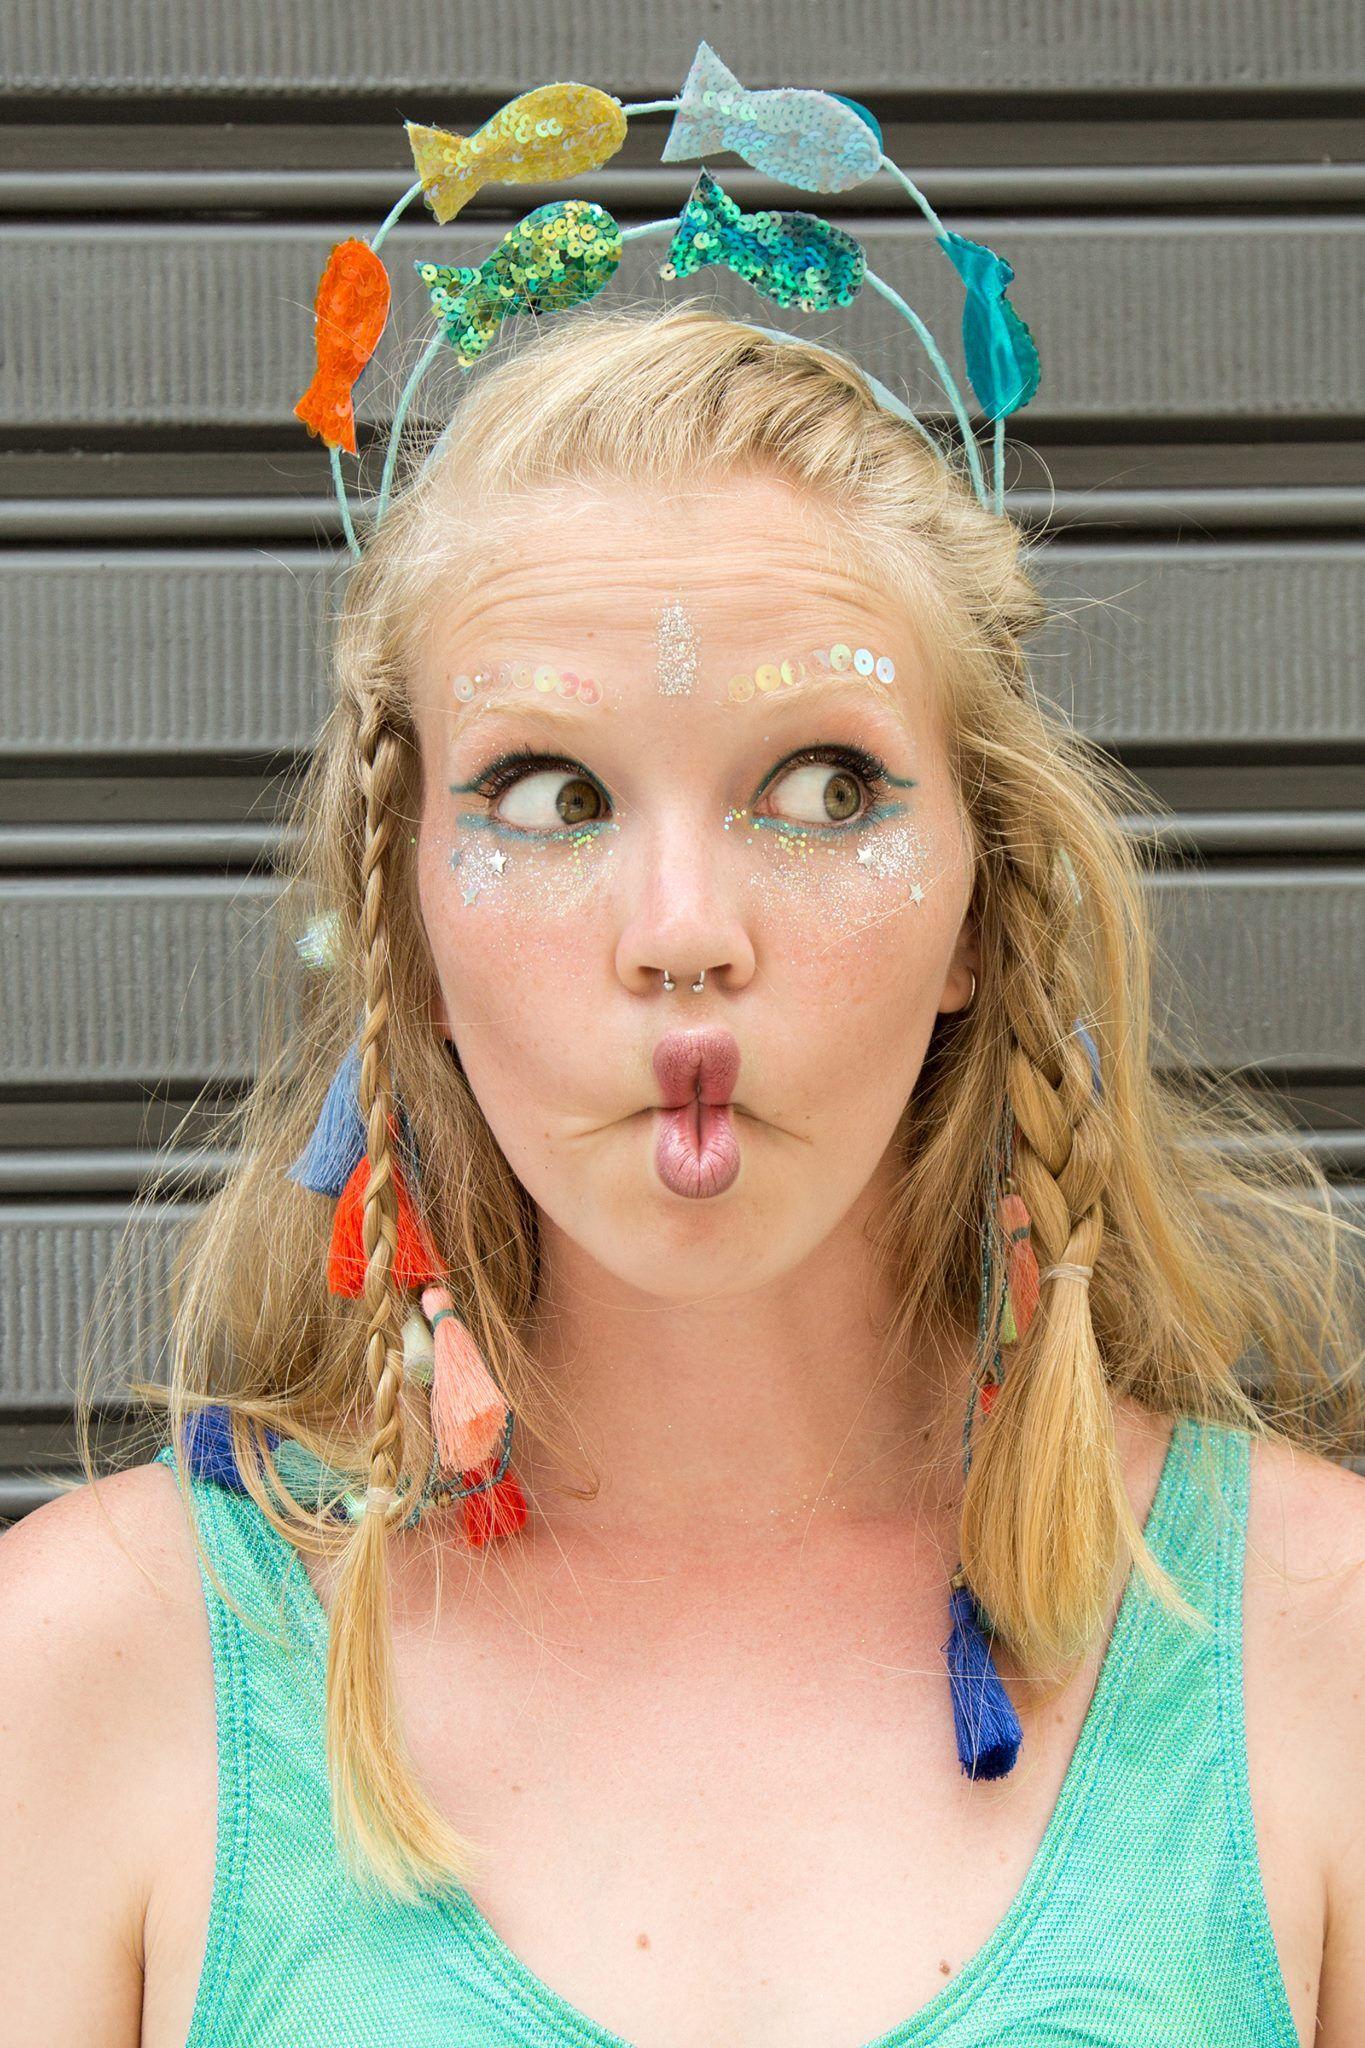 Carnaval | peixinha sereia | via. @mayarapin